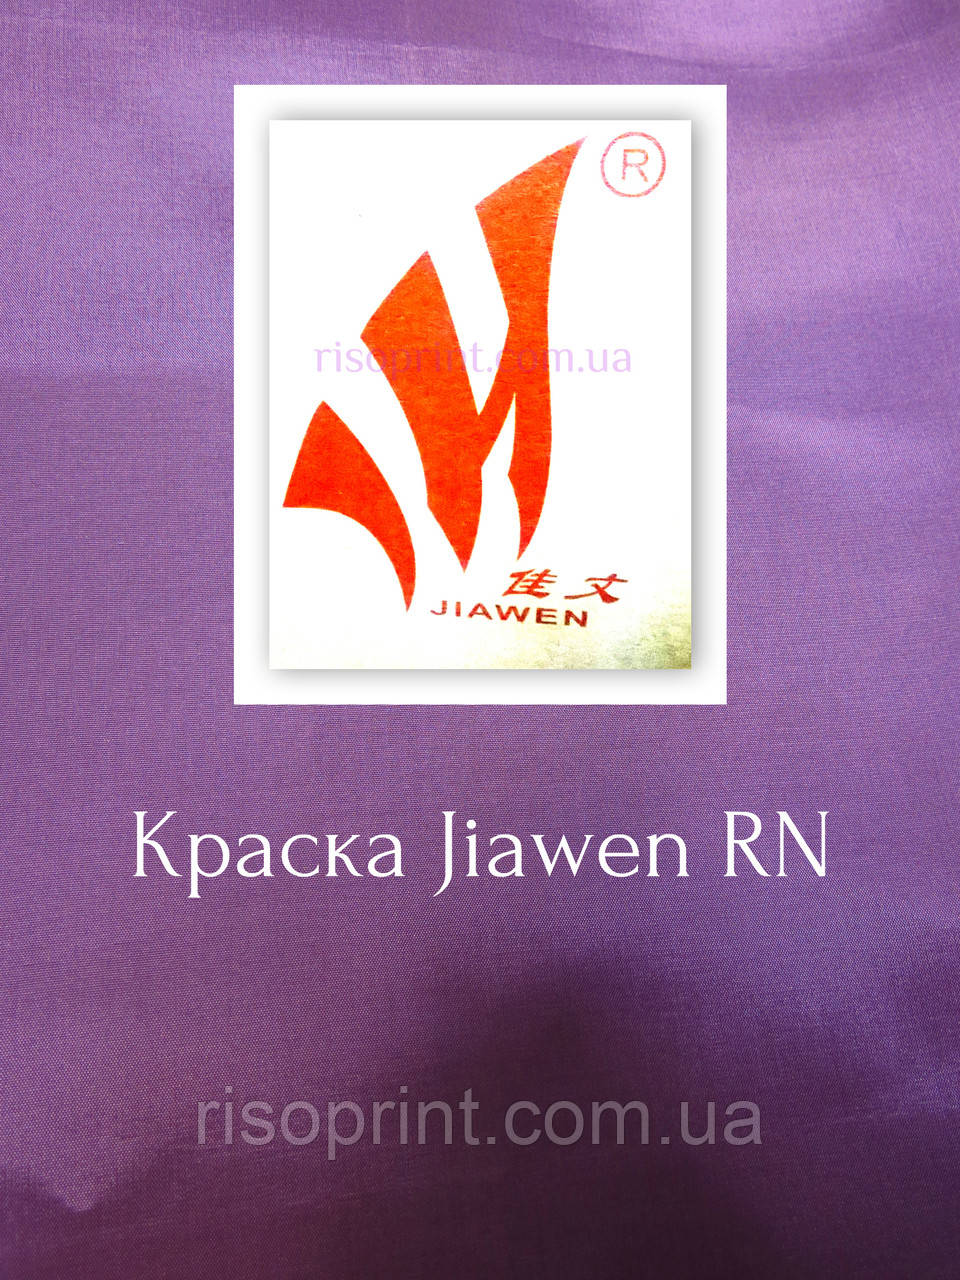 Краска  лицензионная для ризографа Riso Jiawen RN